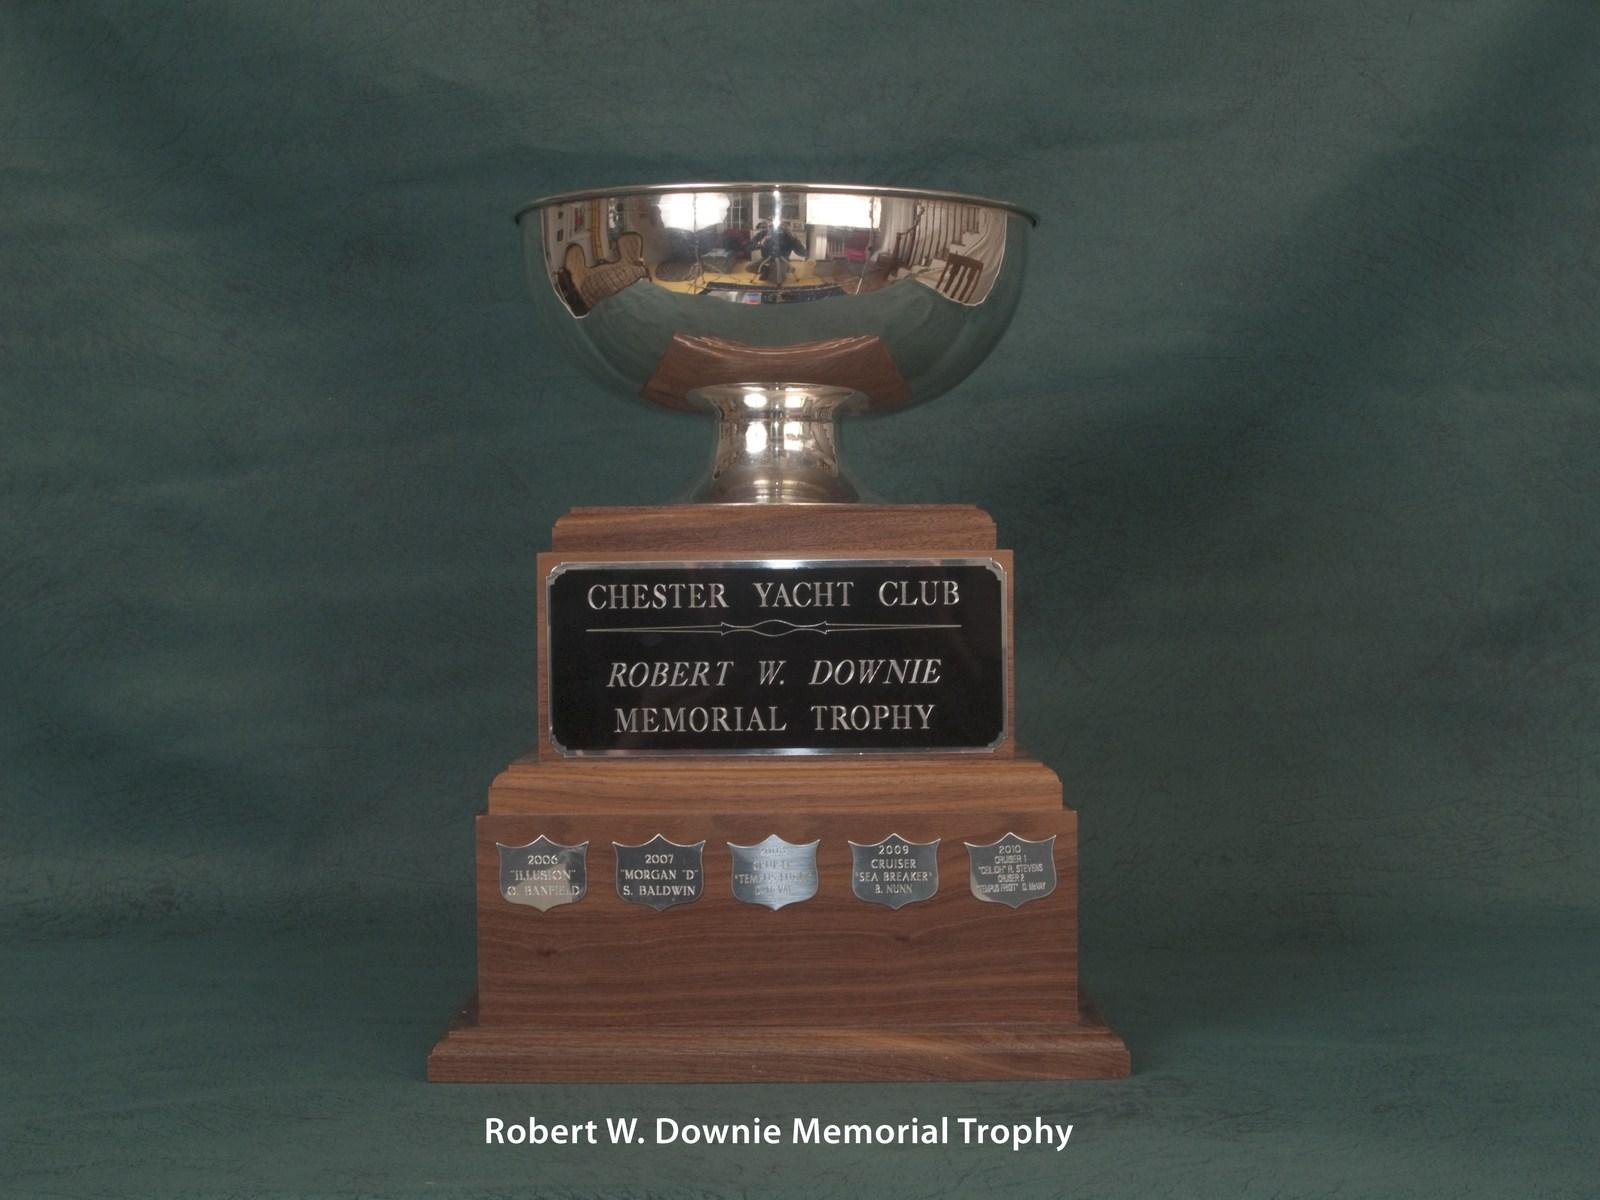 Robert W. Downie Memorial Trophy